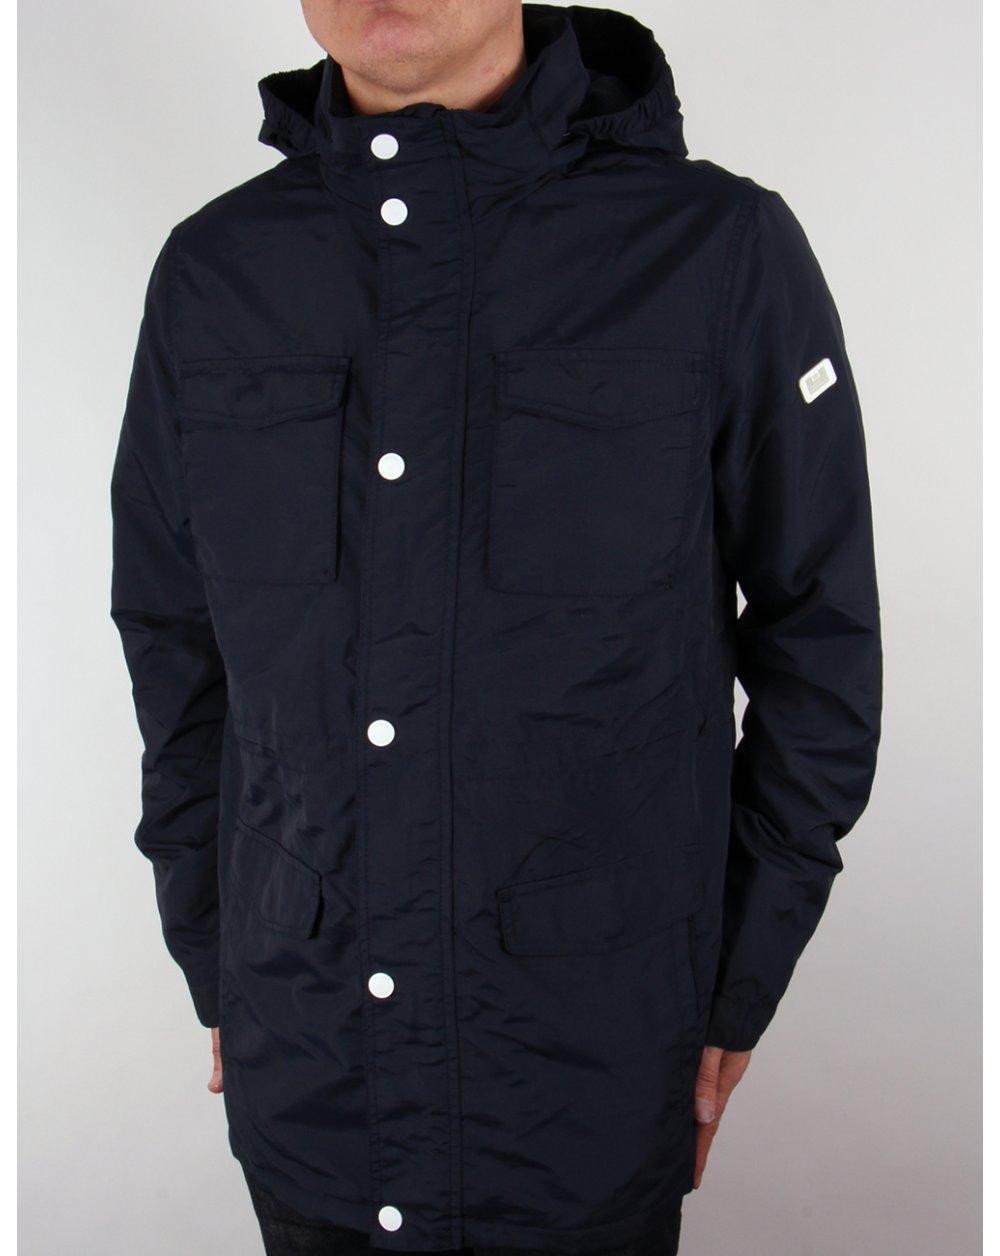 bf97d1289e01 Weekend Offender Akron Jacket Navy Blue,coat,hooded,mac,terrace jacket